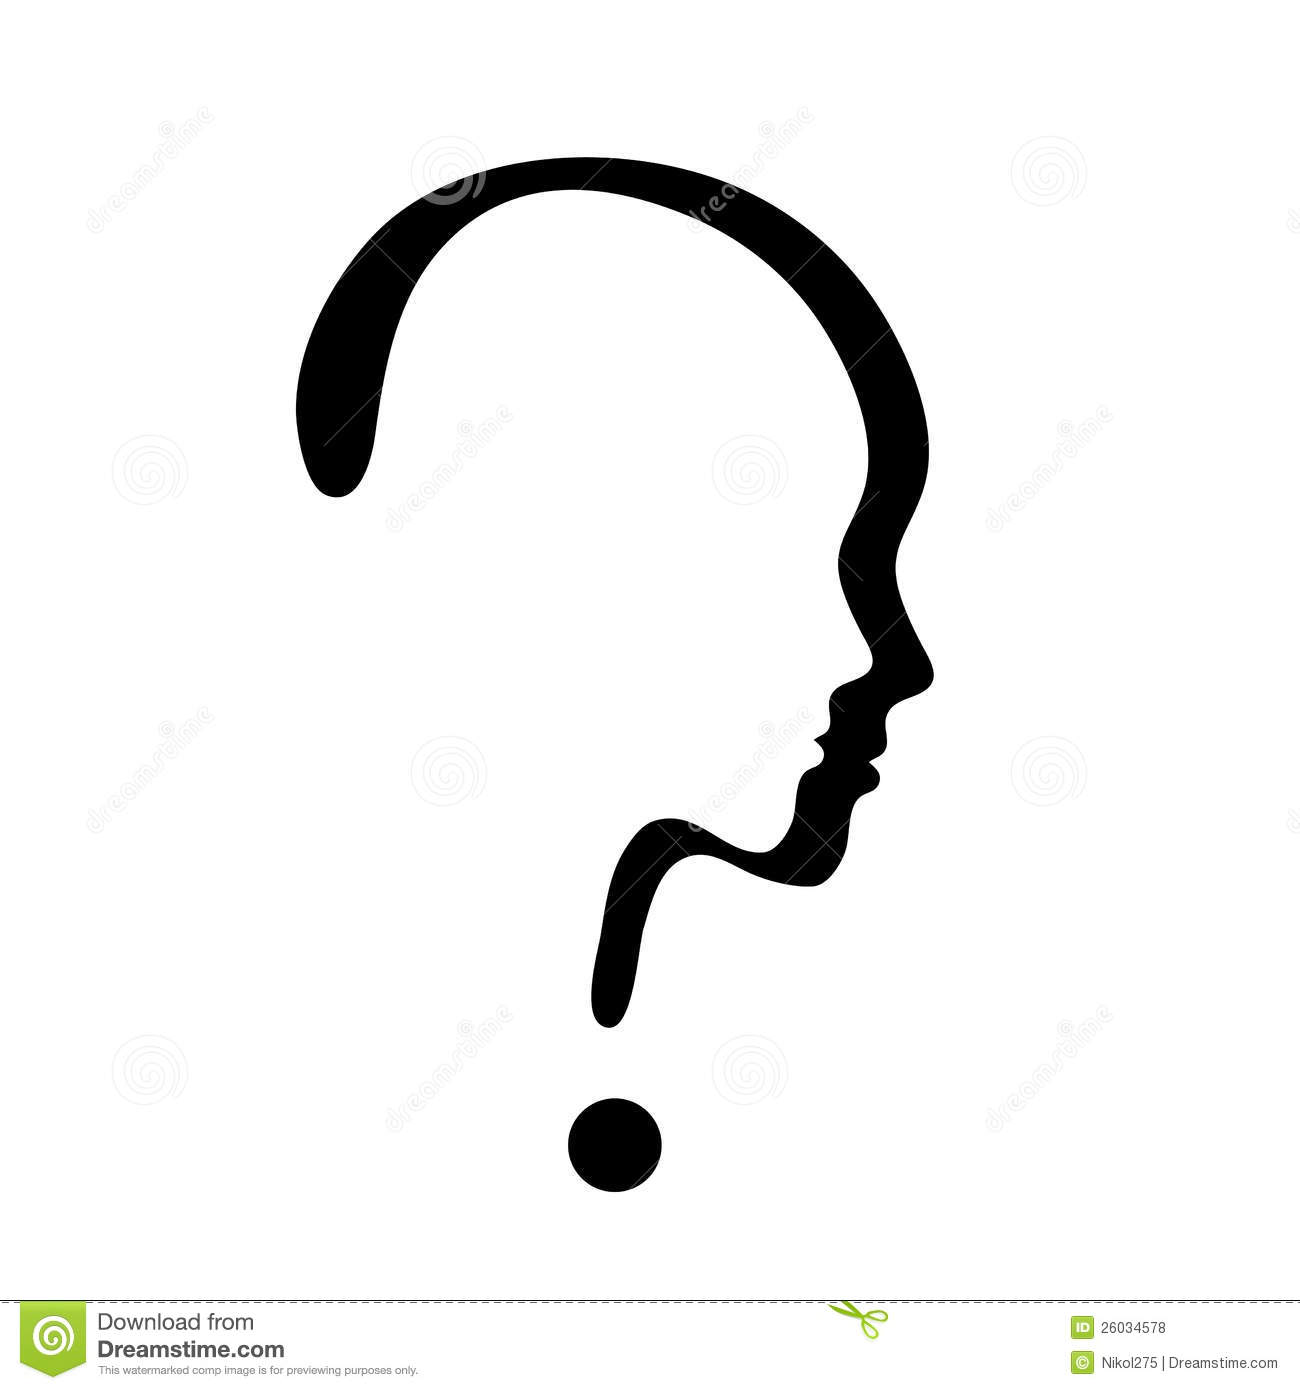 http://thumbs.dreamstime.com/z/%D0%B2%D0%BE%D0%BF%D1%80%D0%BE%D1%81%D0%B8%D1%82%D0%B5%D0%BB%D1%8C%D0%BD%D1%8B%D0%B9-%D0%B7%D0%BD%D0%B0%D0%BA-26034578.jpg